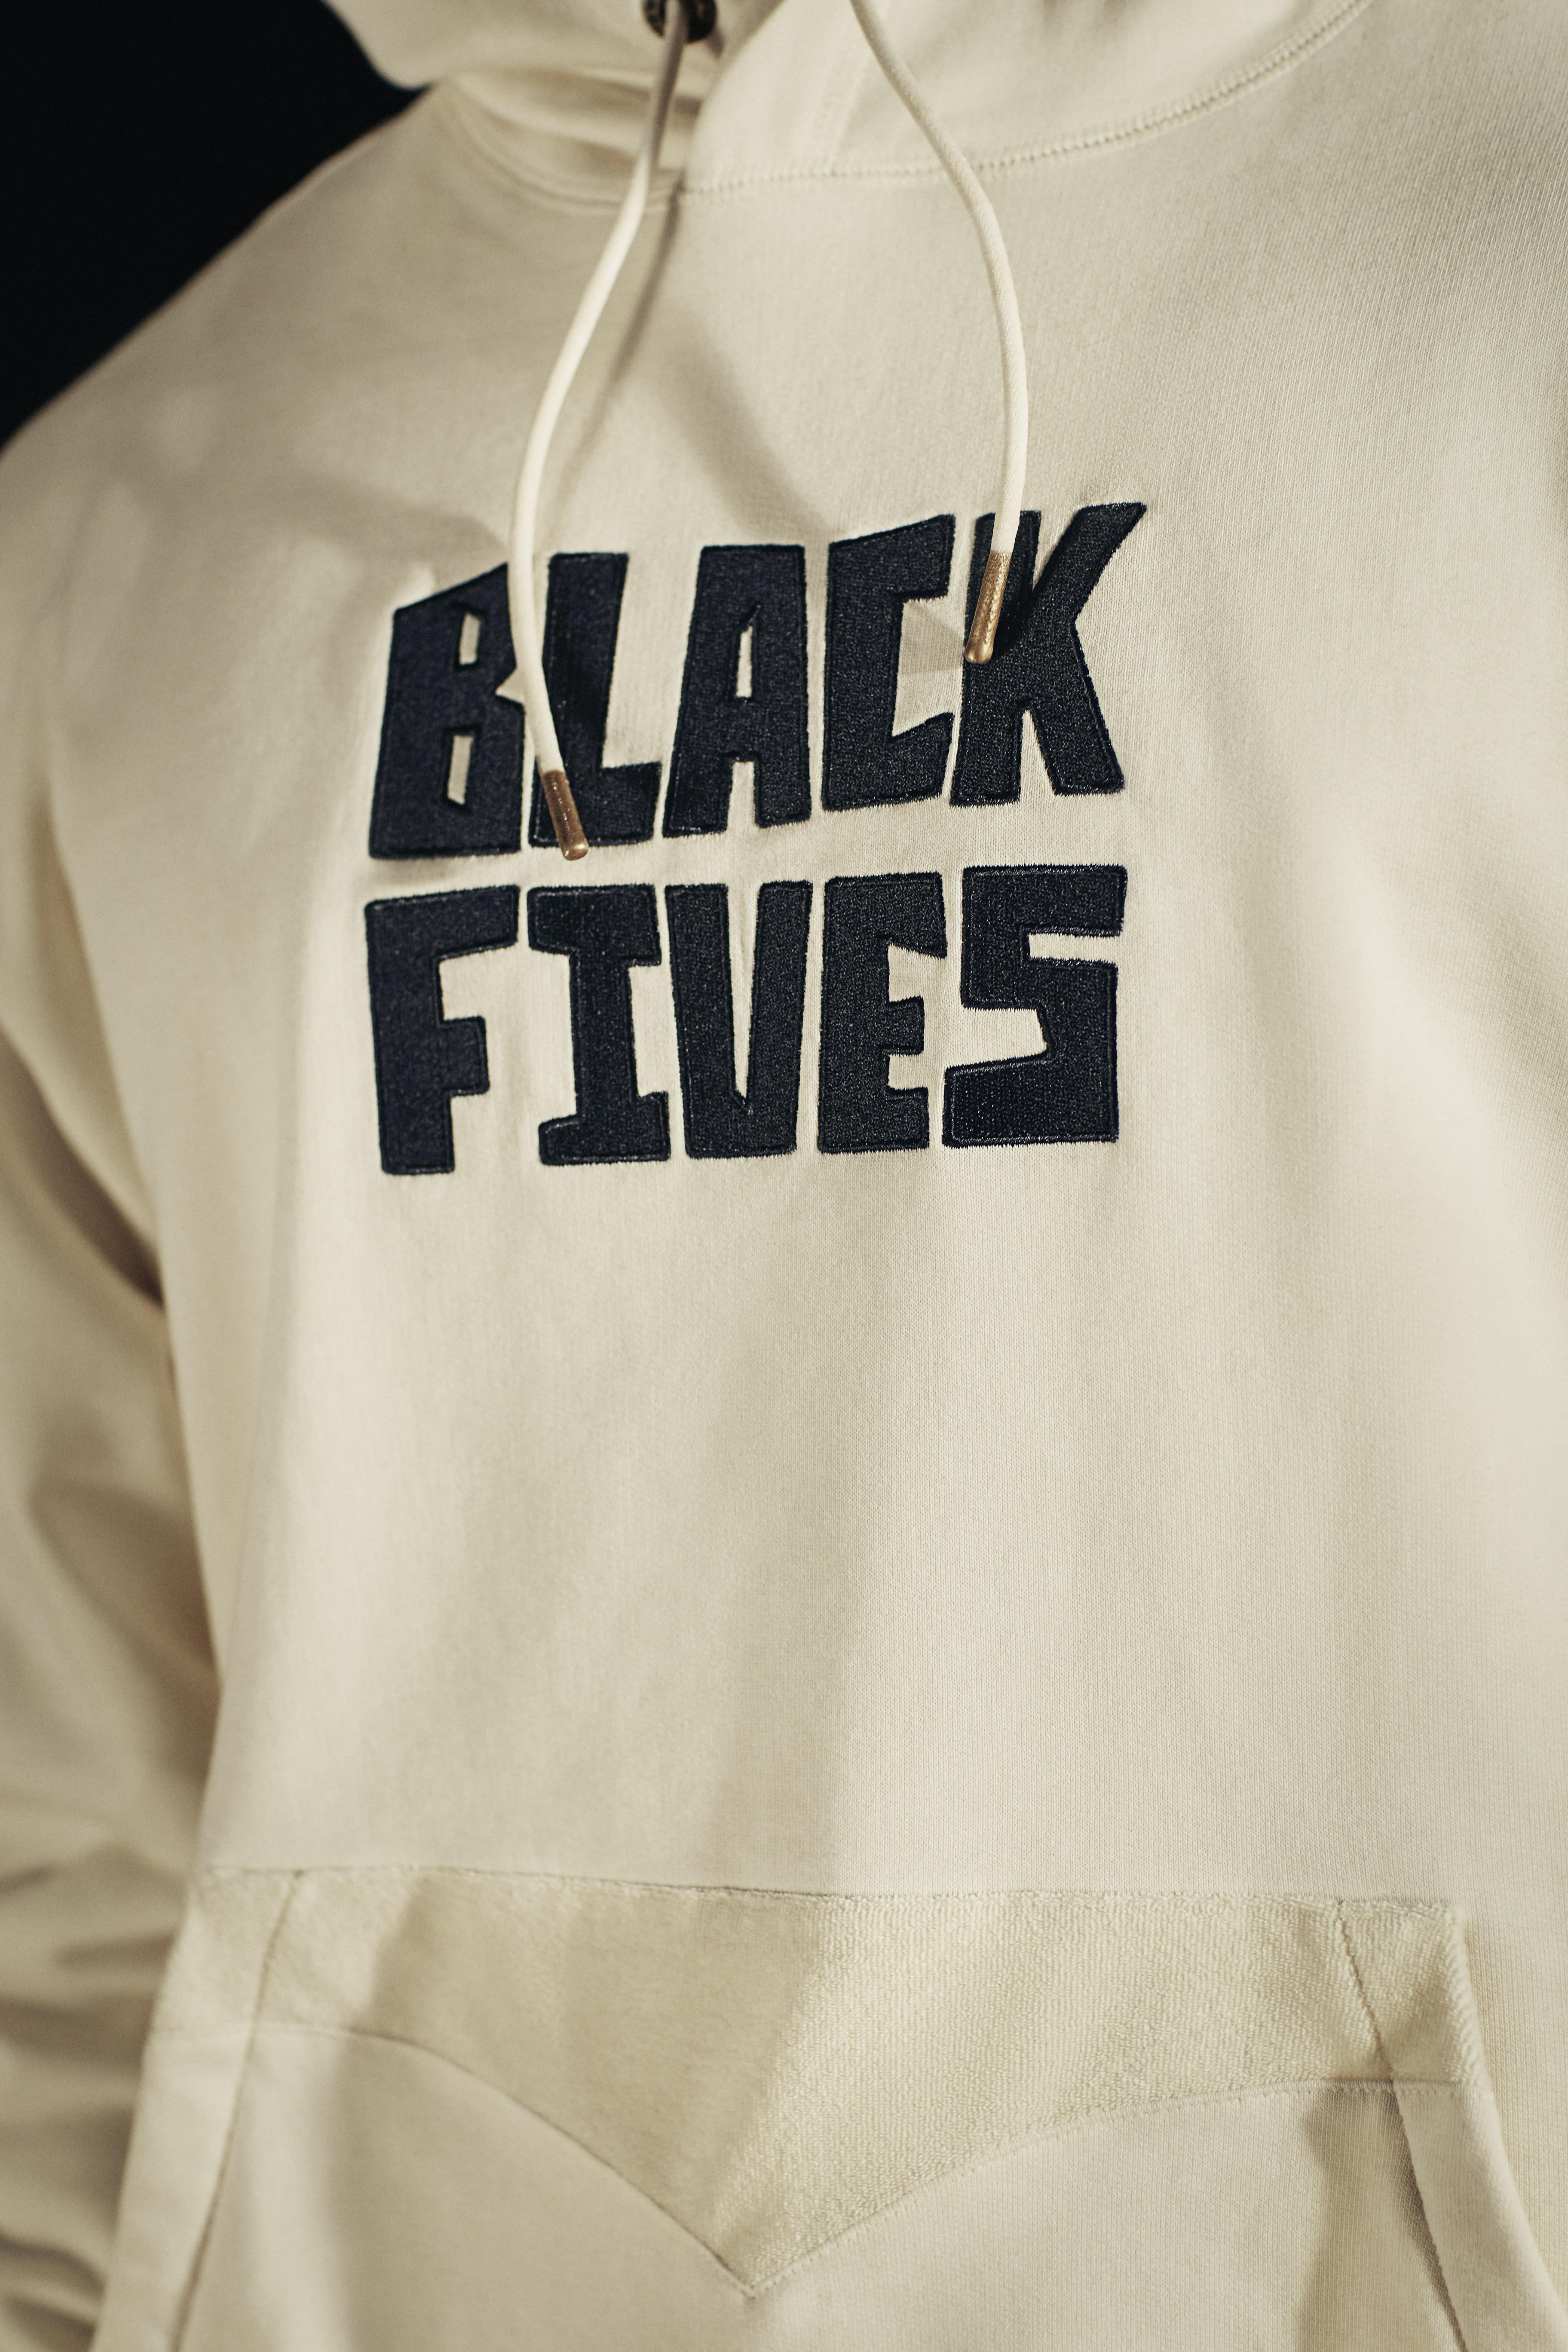 Puma x Black Fives Foundation Apparel